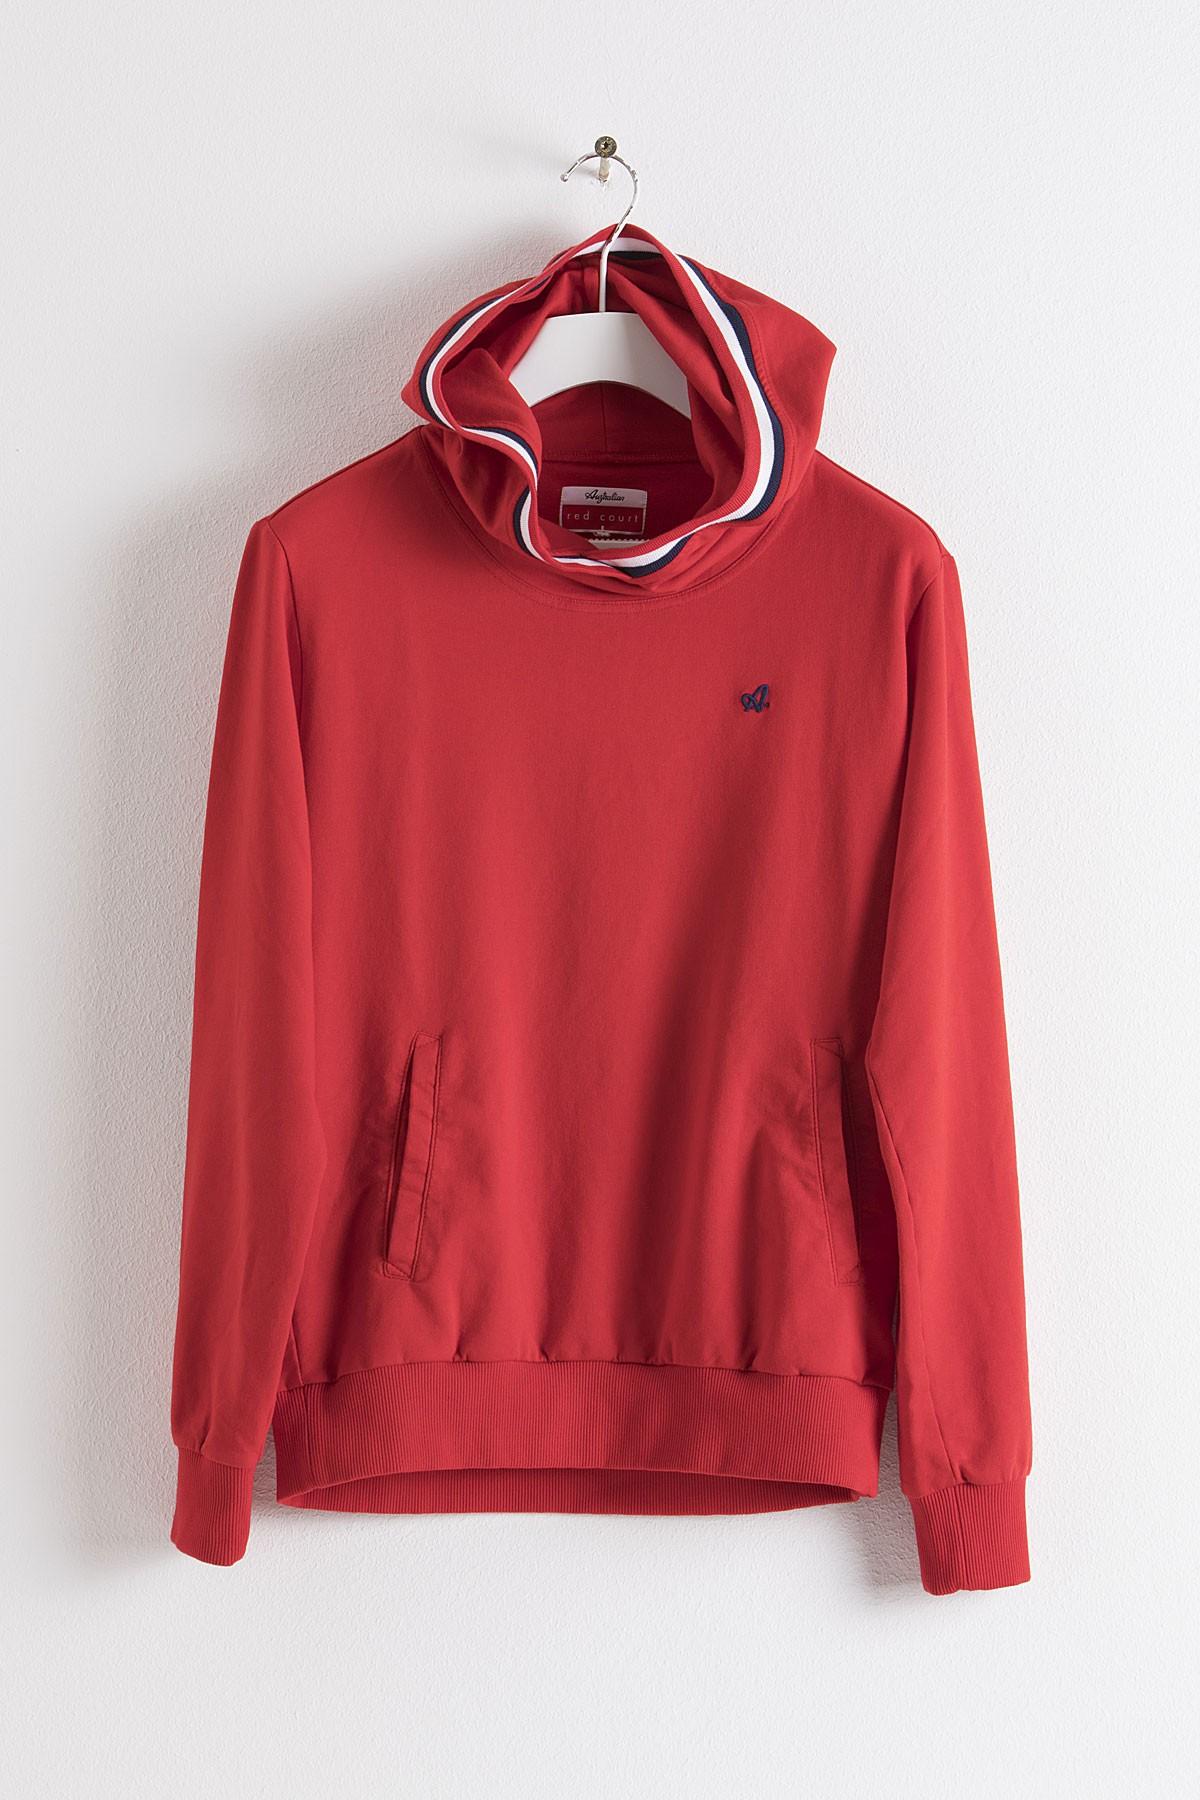 Sweatshirt for man AUSTRALIAN S/S 18